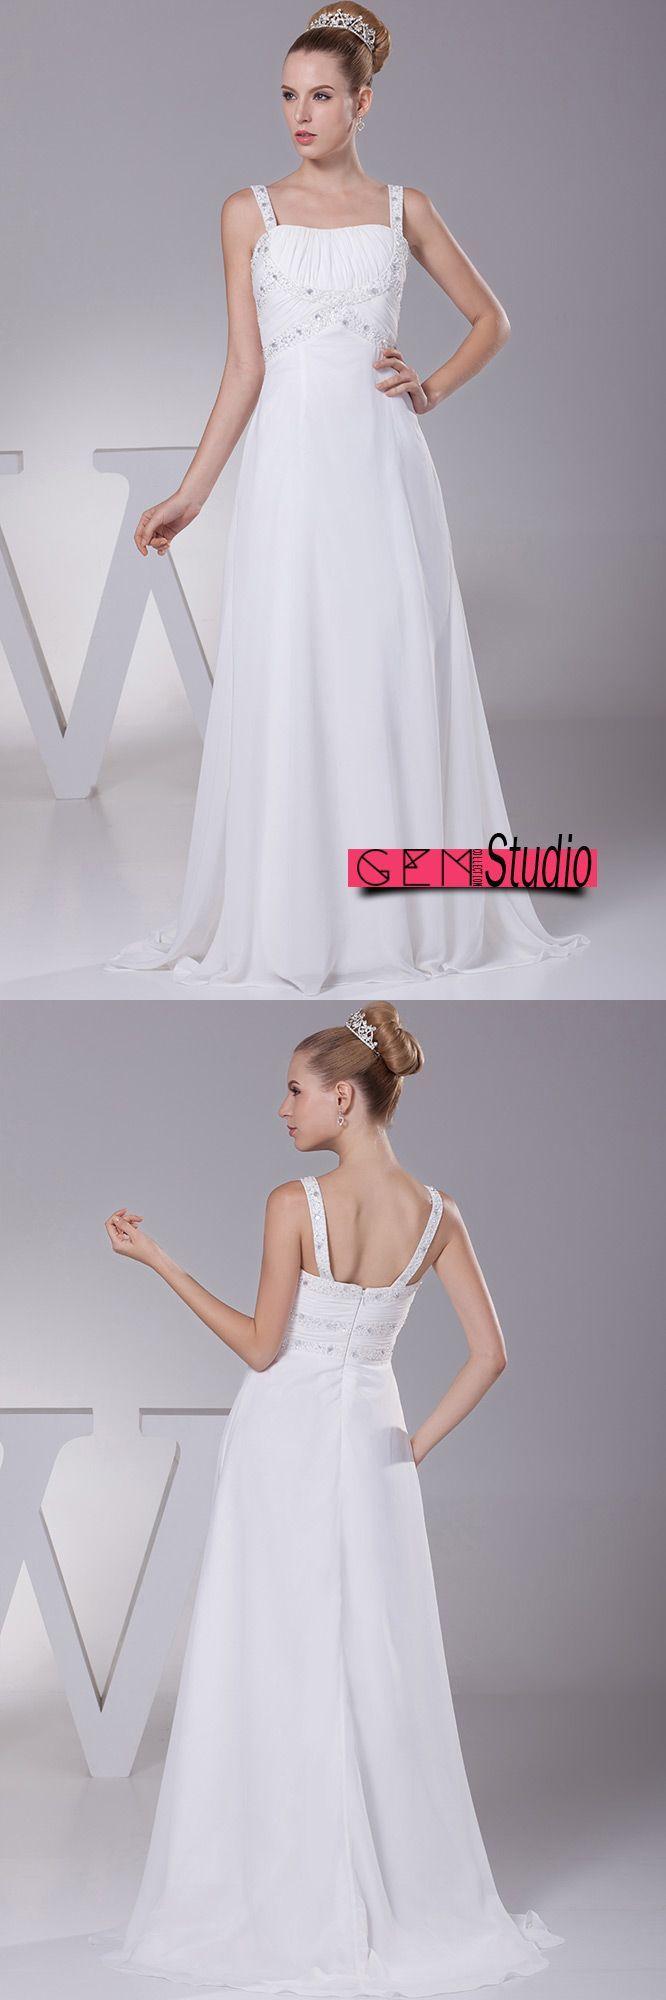 Wedding dress without train  Plain White Beading Straps Long Pleated Wedding Dress with Little